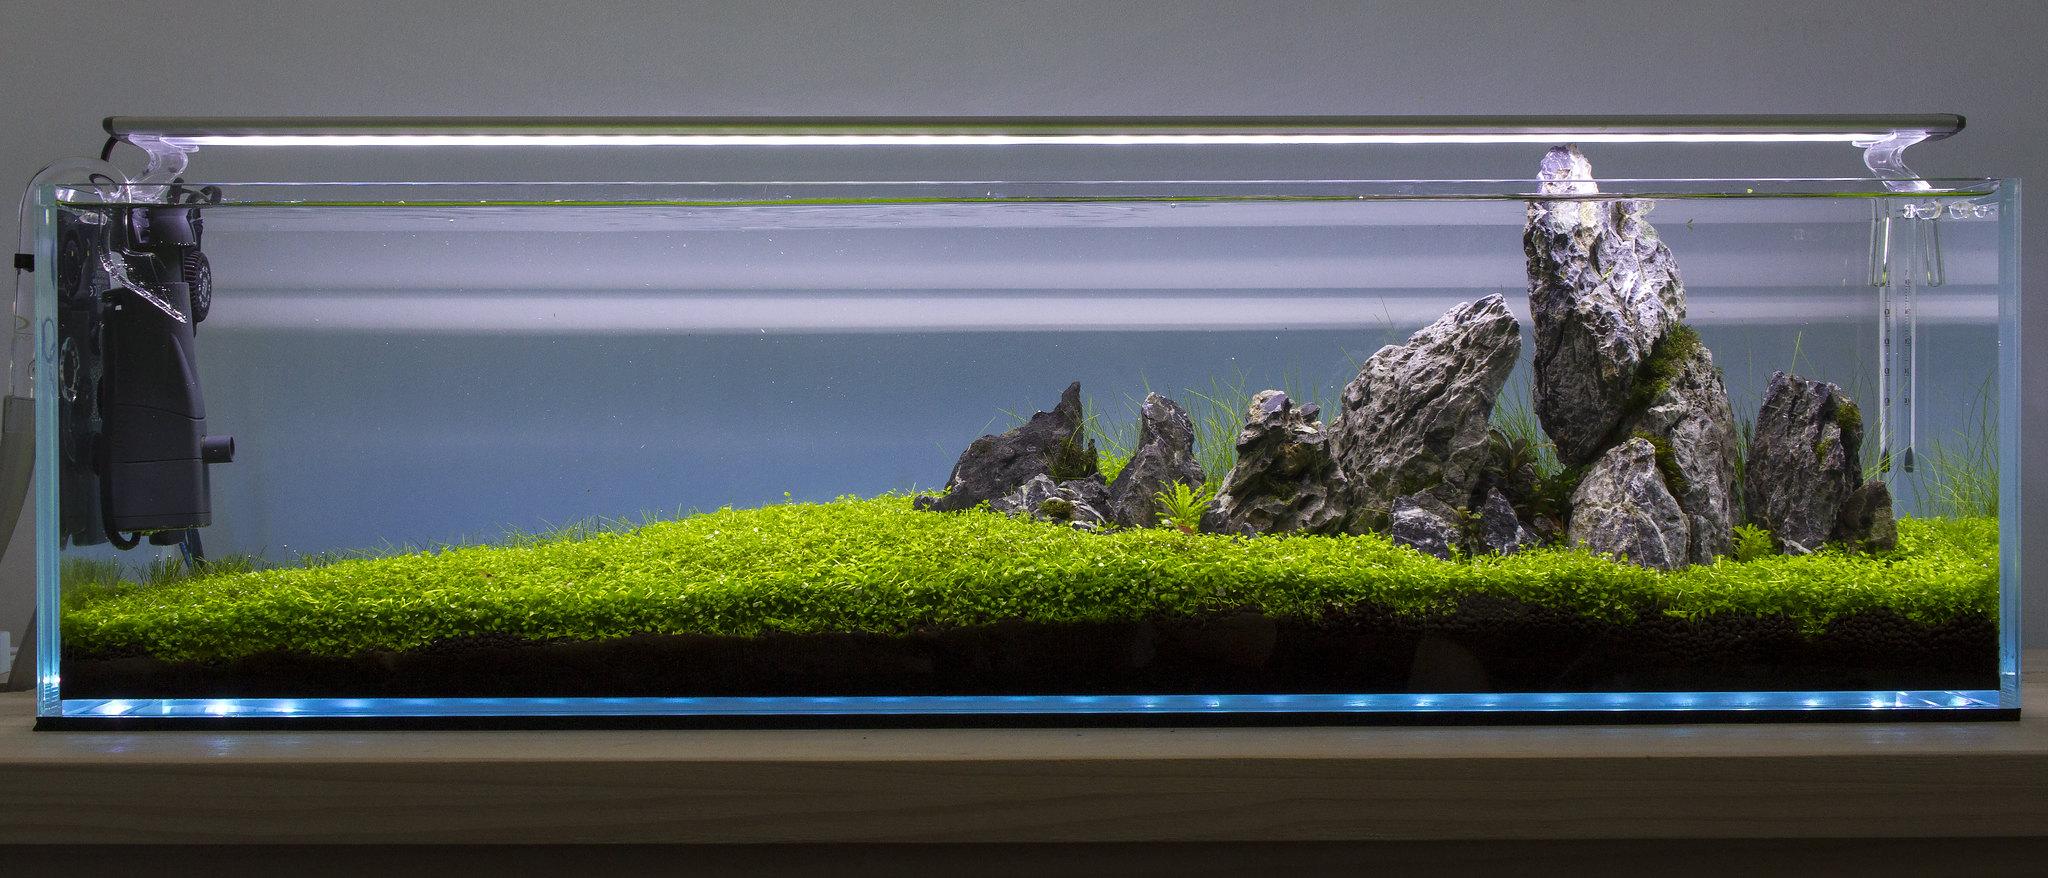 3ft Bookshelf Aquarium Aquascape By Colm Doyle On Flickr